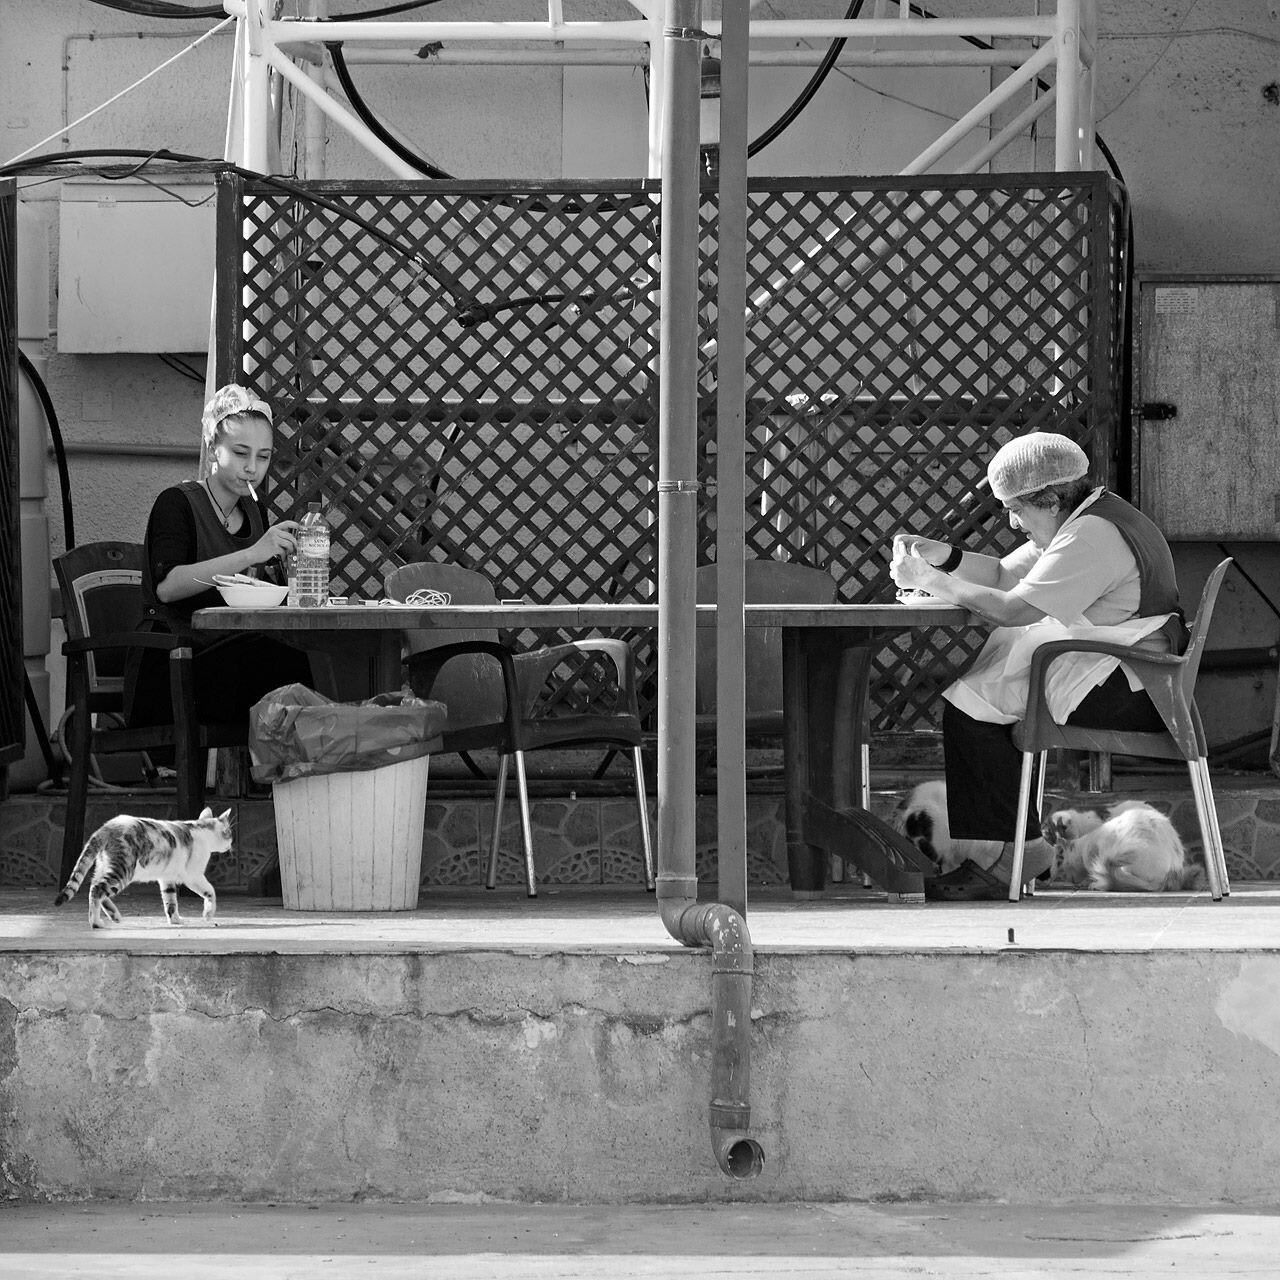 Ларнака, Кипр, 2018. Фотограф Борис Назаренко